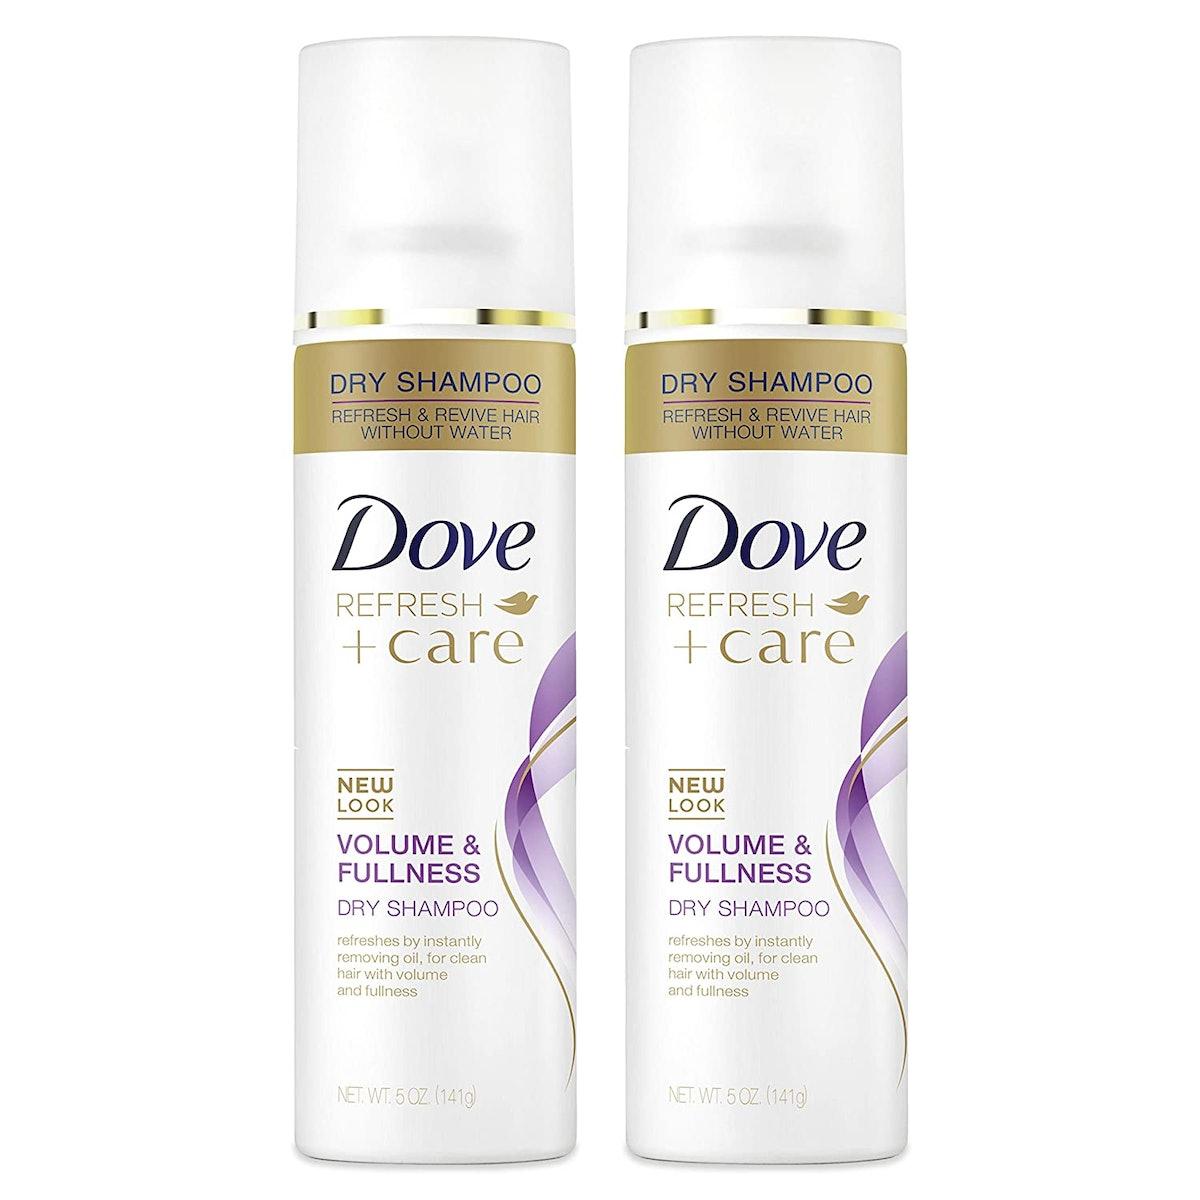 Dove Refresh + Care Volume & Fullness Dry Shampoo (2-Pack)